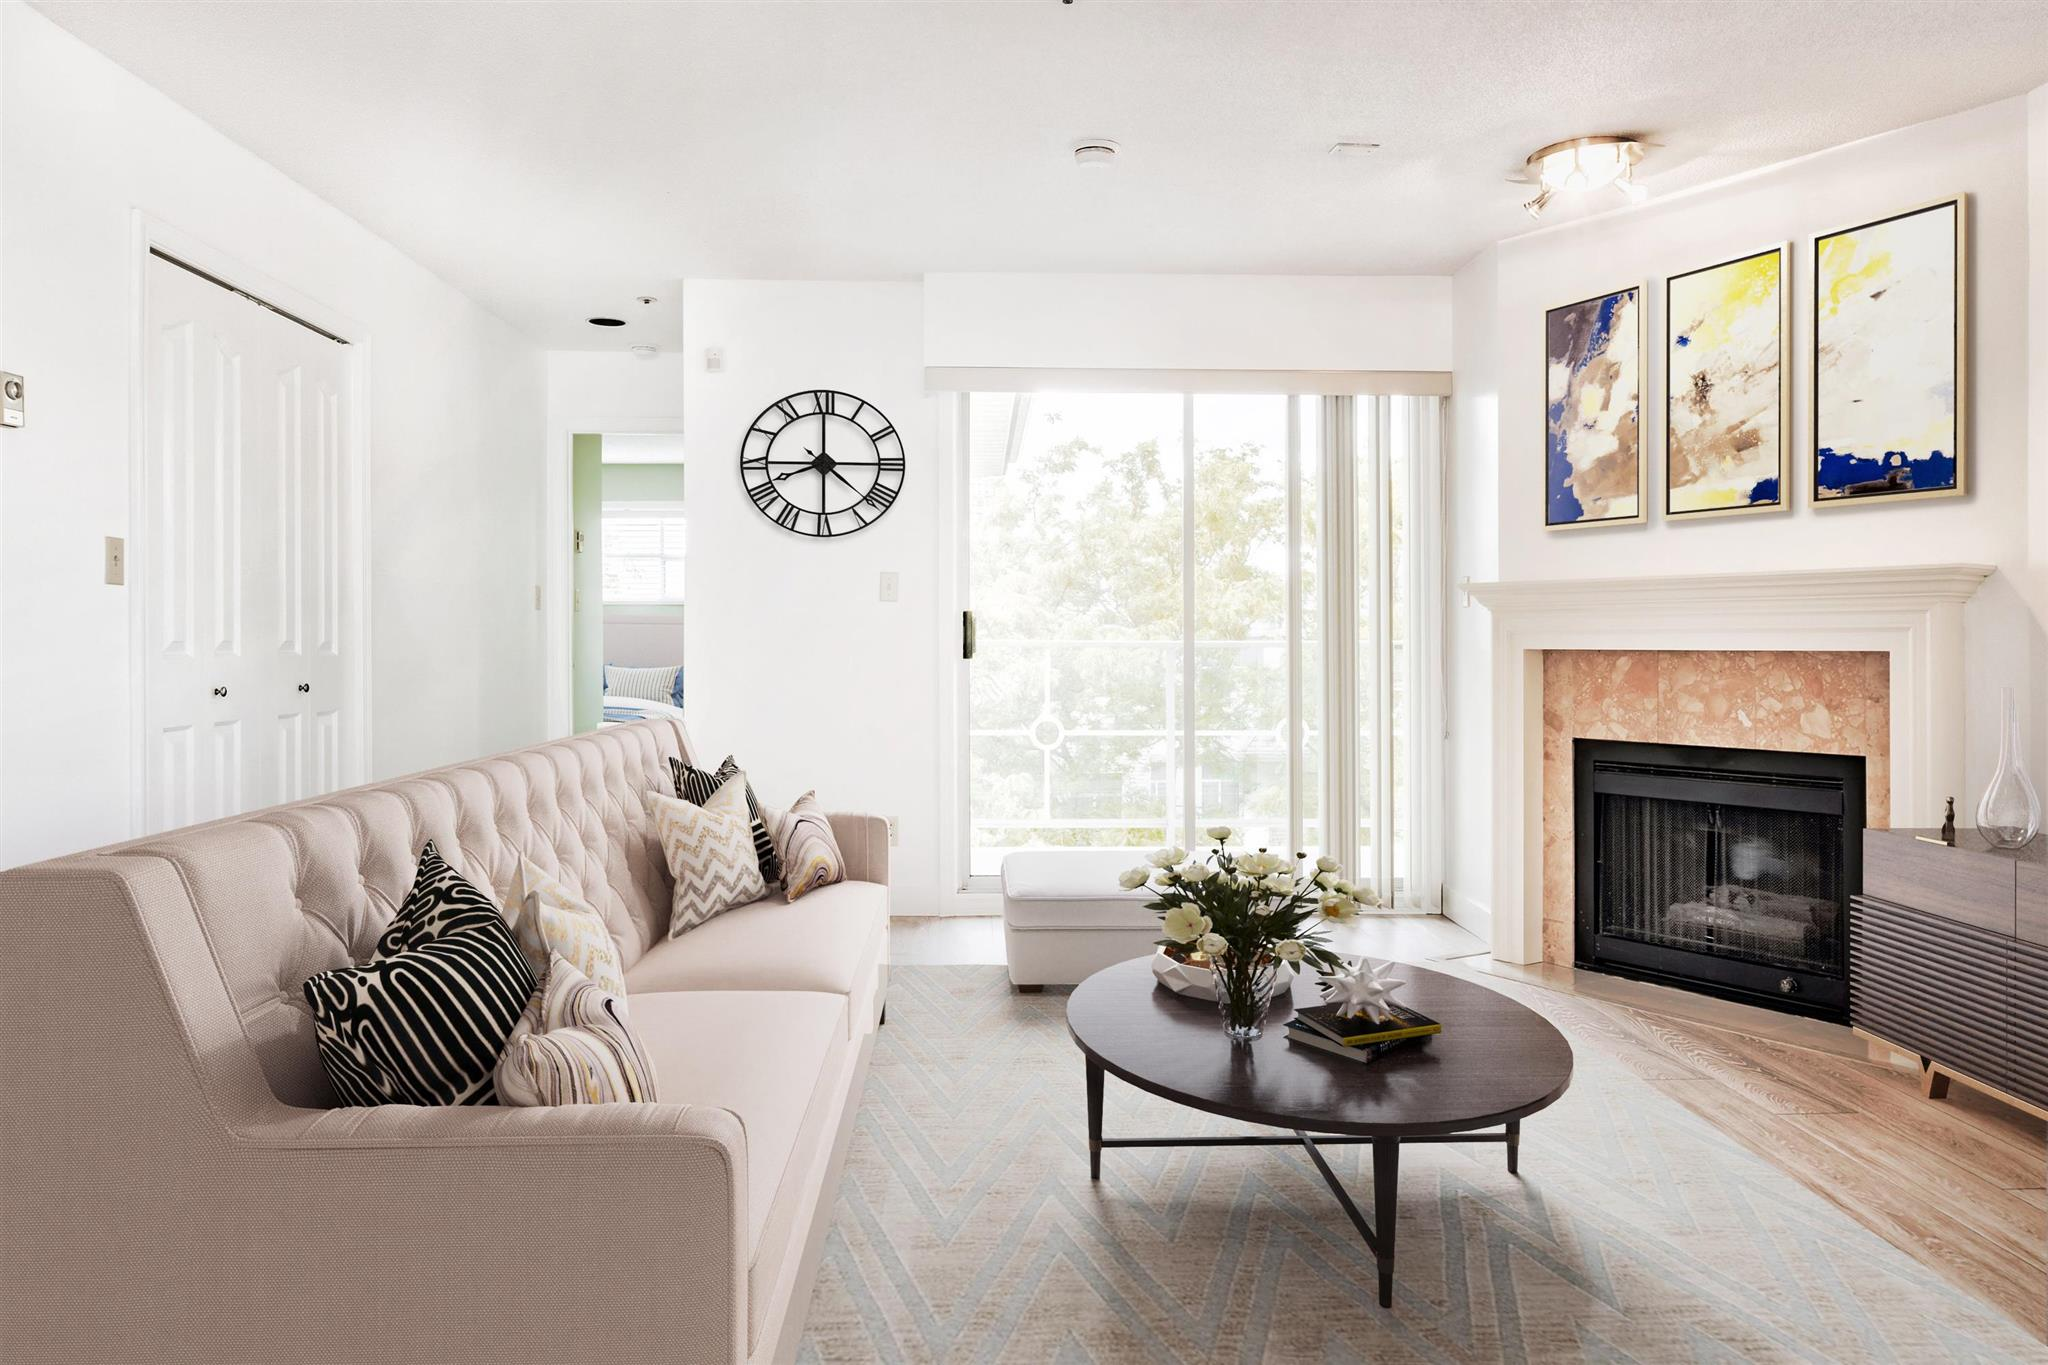 405 3680 RAE AVENUE - Collingwood VE Apartment/Condo for sale, 2 Bedrooms (R2619580)